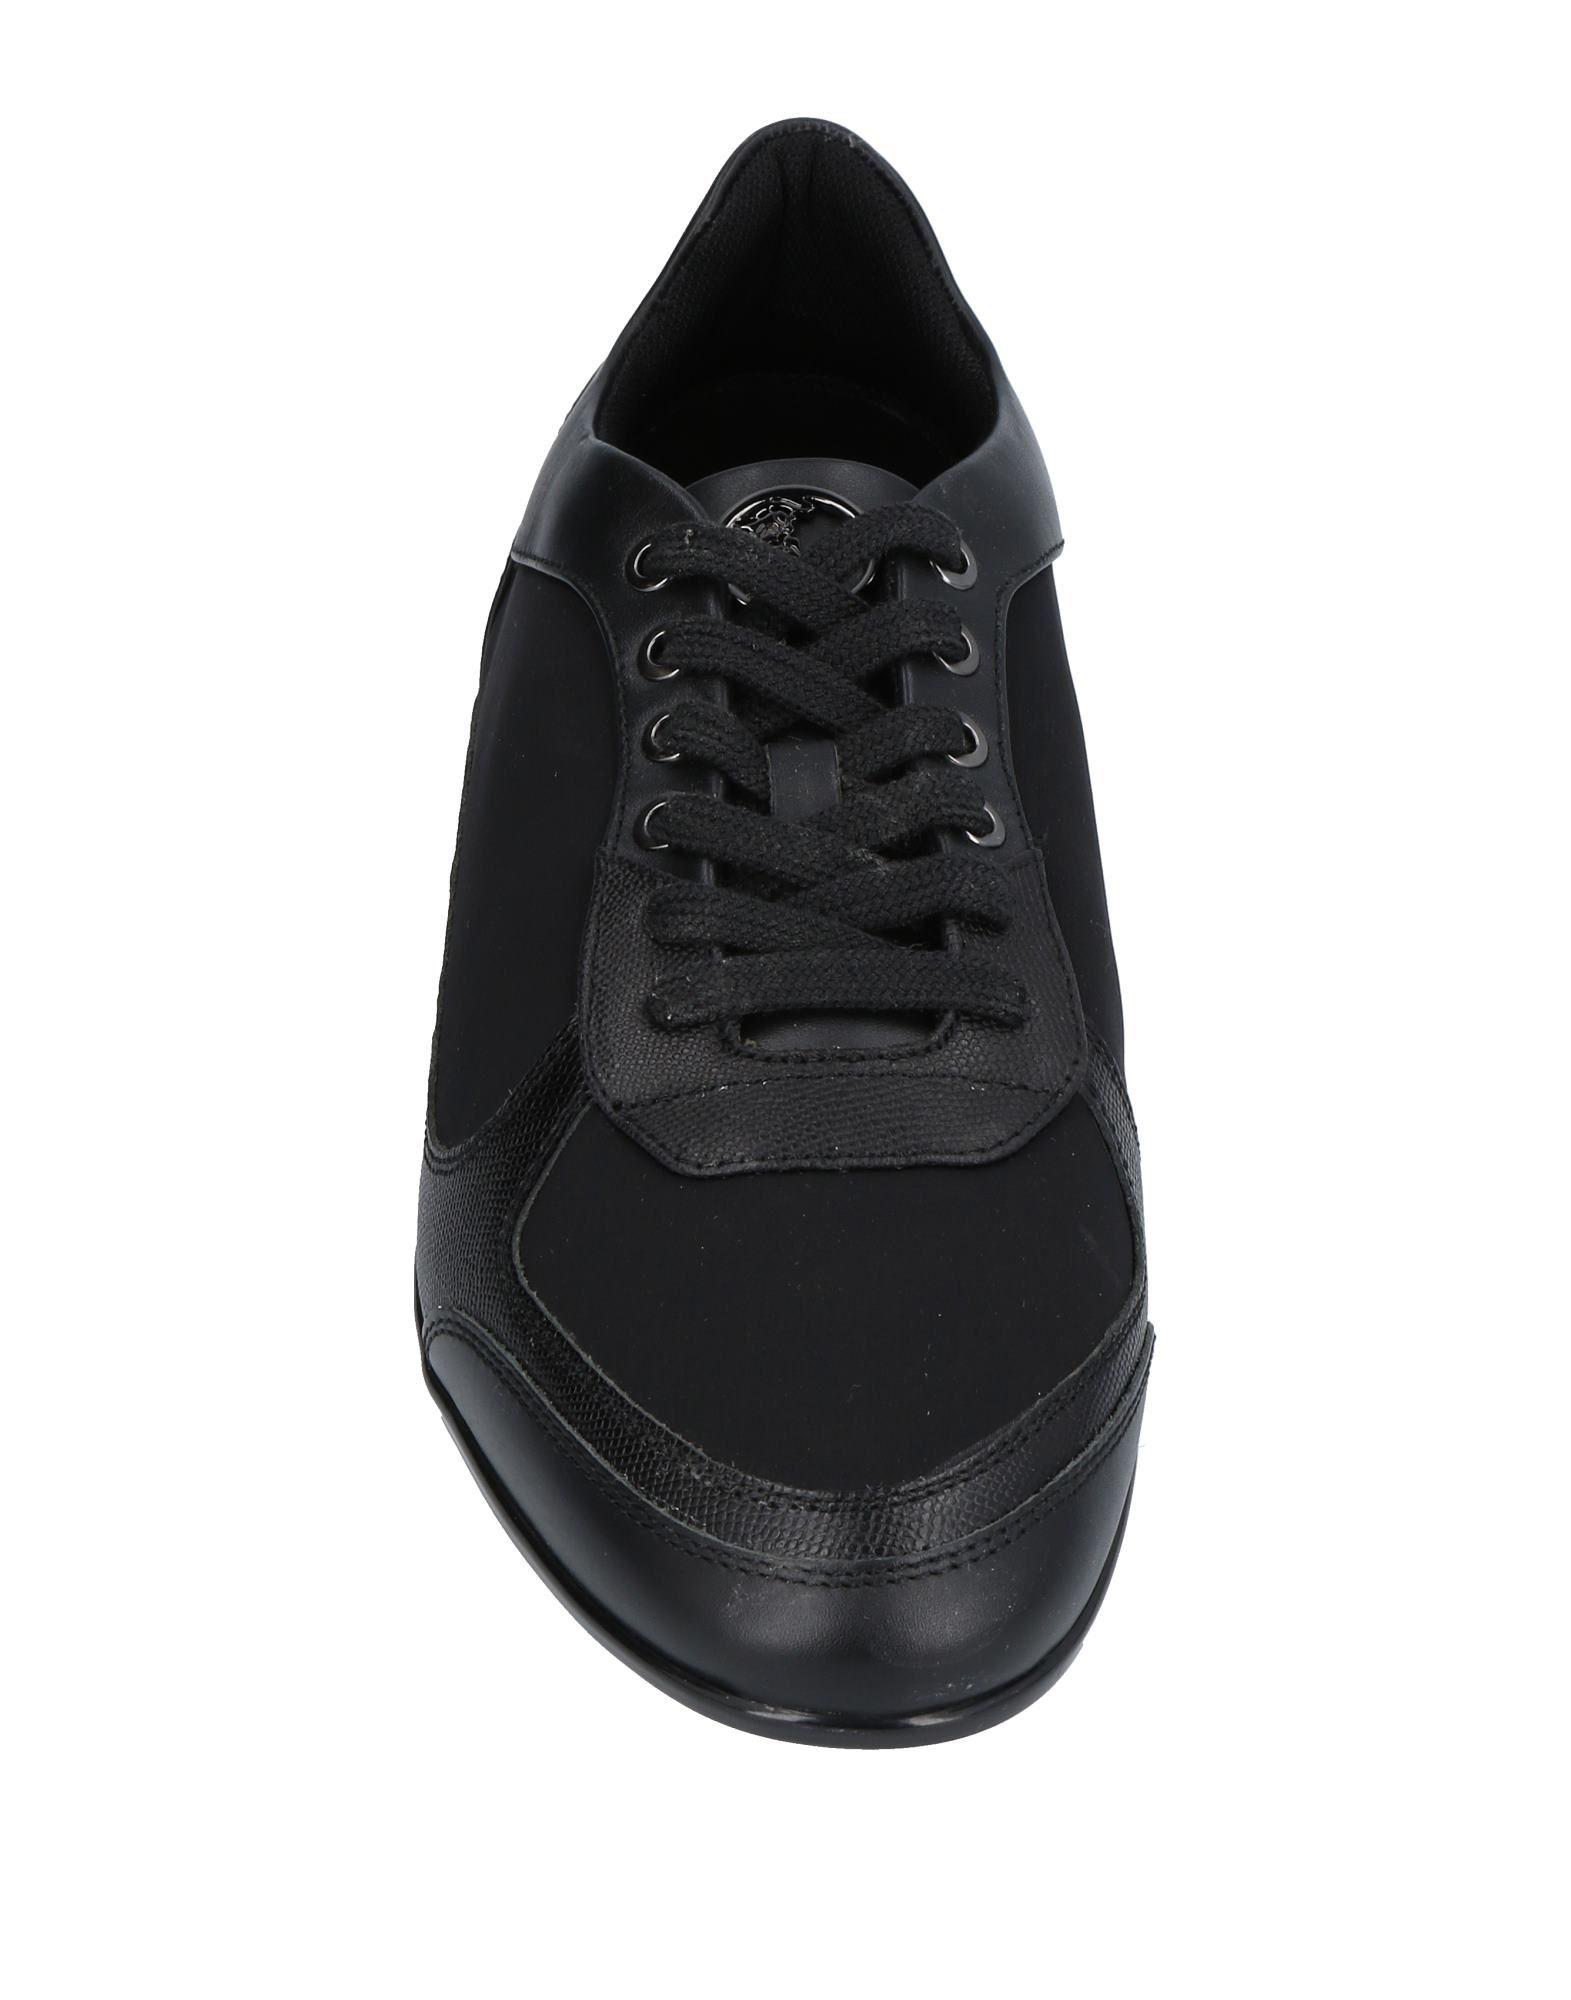 Versace Collection Sneakers Herren  11461058CP 11461058CP 11461058CP Neue Schuhe 5b308b